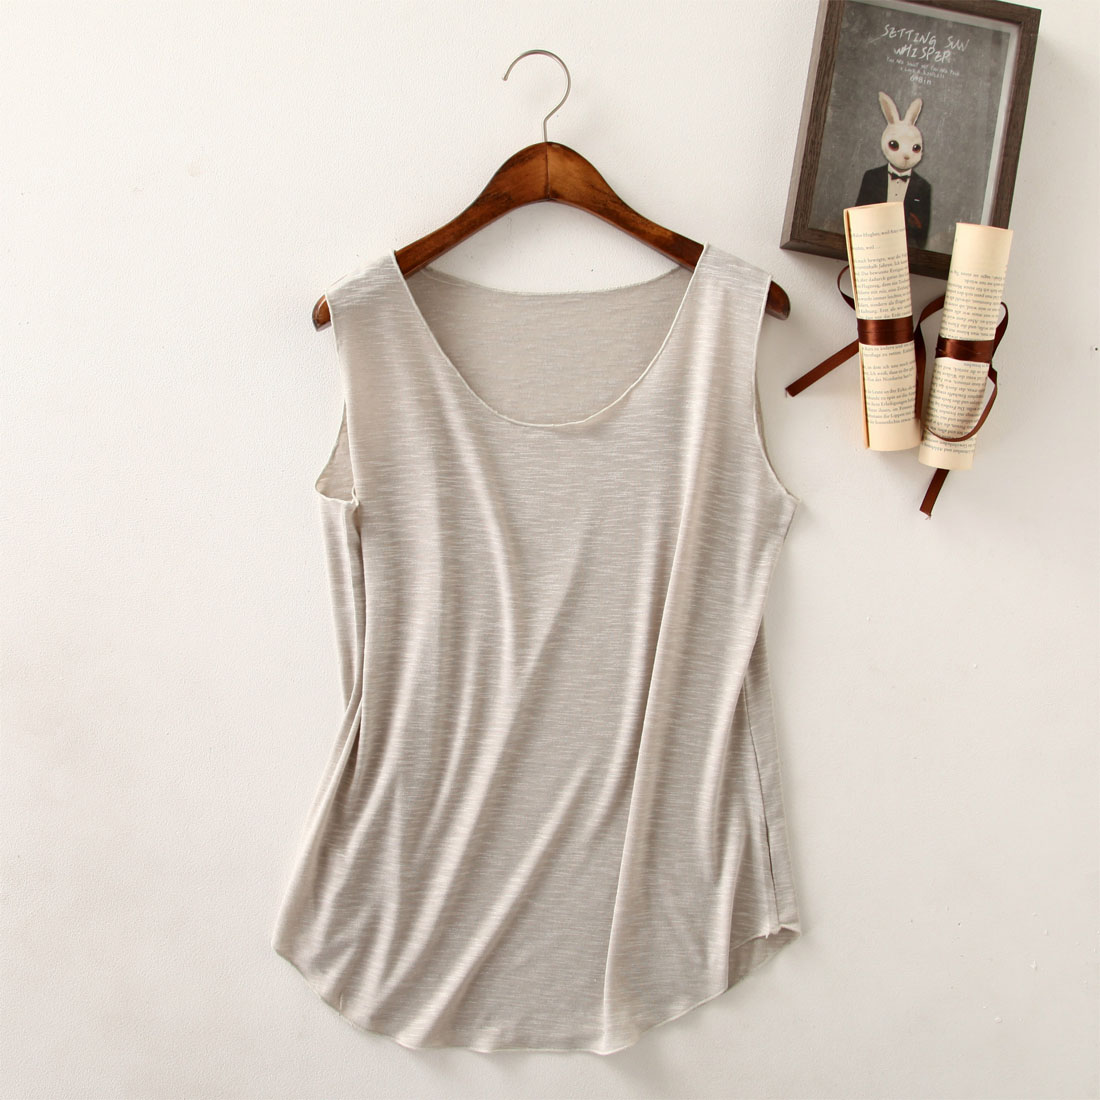 NEW Spring Summer New Tank Tops Women Sleeveless Round Neck Loose T Shirt Ladies Vest Singlets